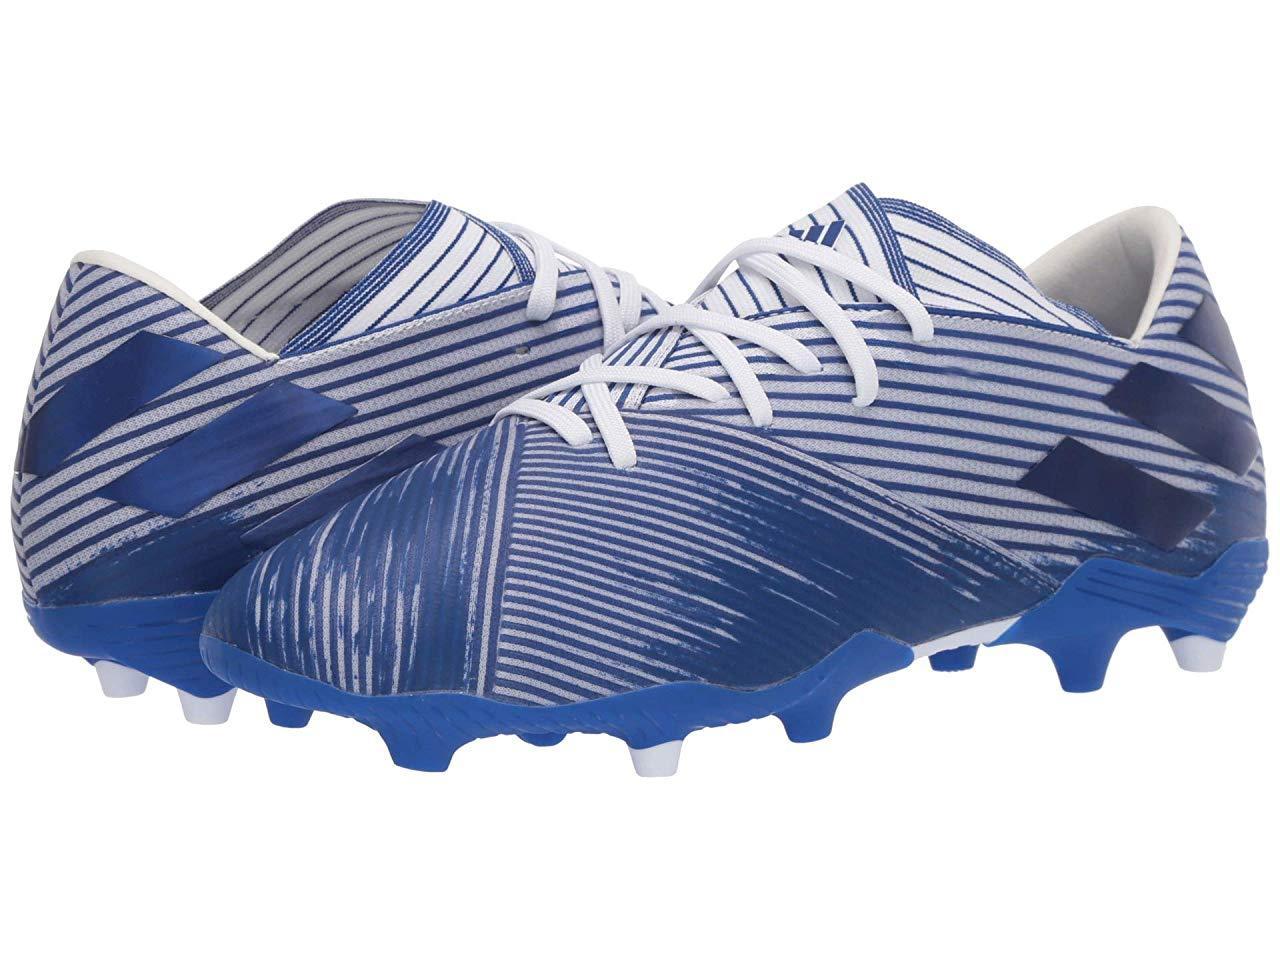 Кроссовки/Кеды adidas Nemeziz 19.2 FG Footwear White/Team Royal Blue/Team Royal Blue